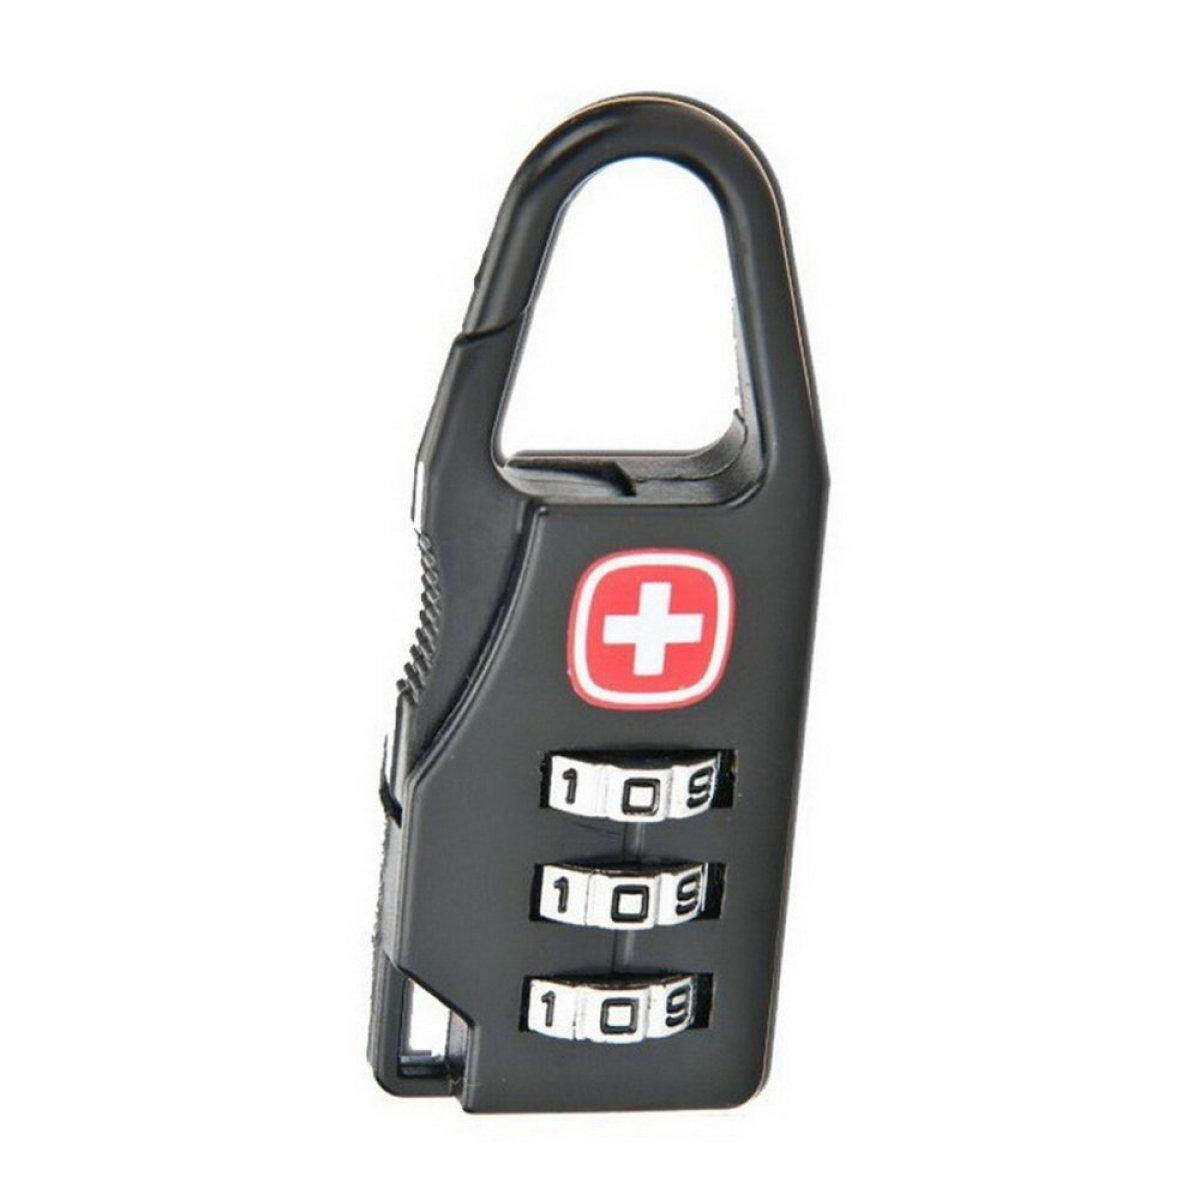 ELENXS Hard Alloy Luggage Security Key Mini 3 Dial Safe Number Code Padlock Combination Lock